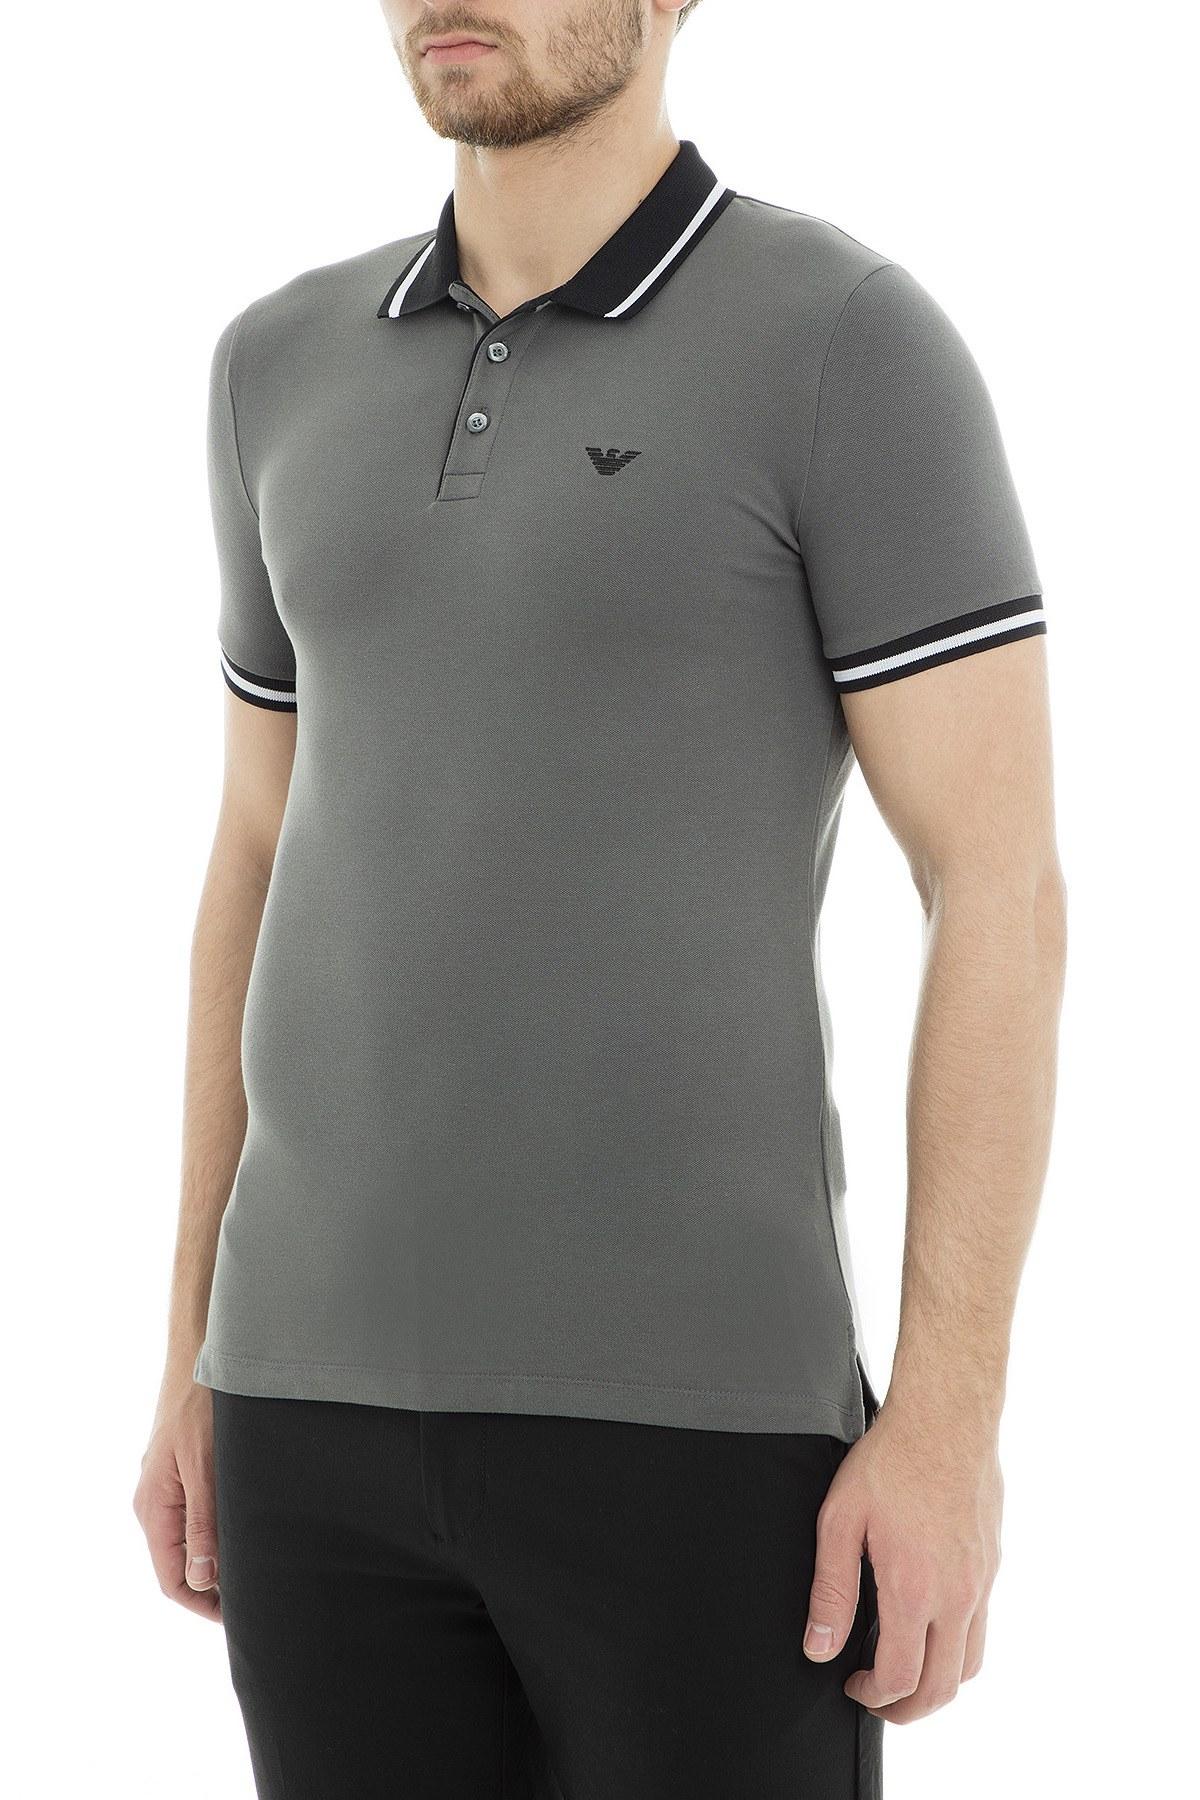 Emporio Armani Polo Erkek T Shirt 3G1F66 1J46Z 0641 GRİ